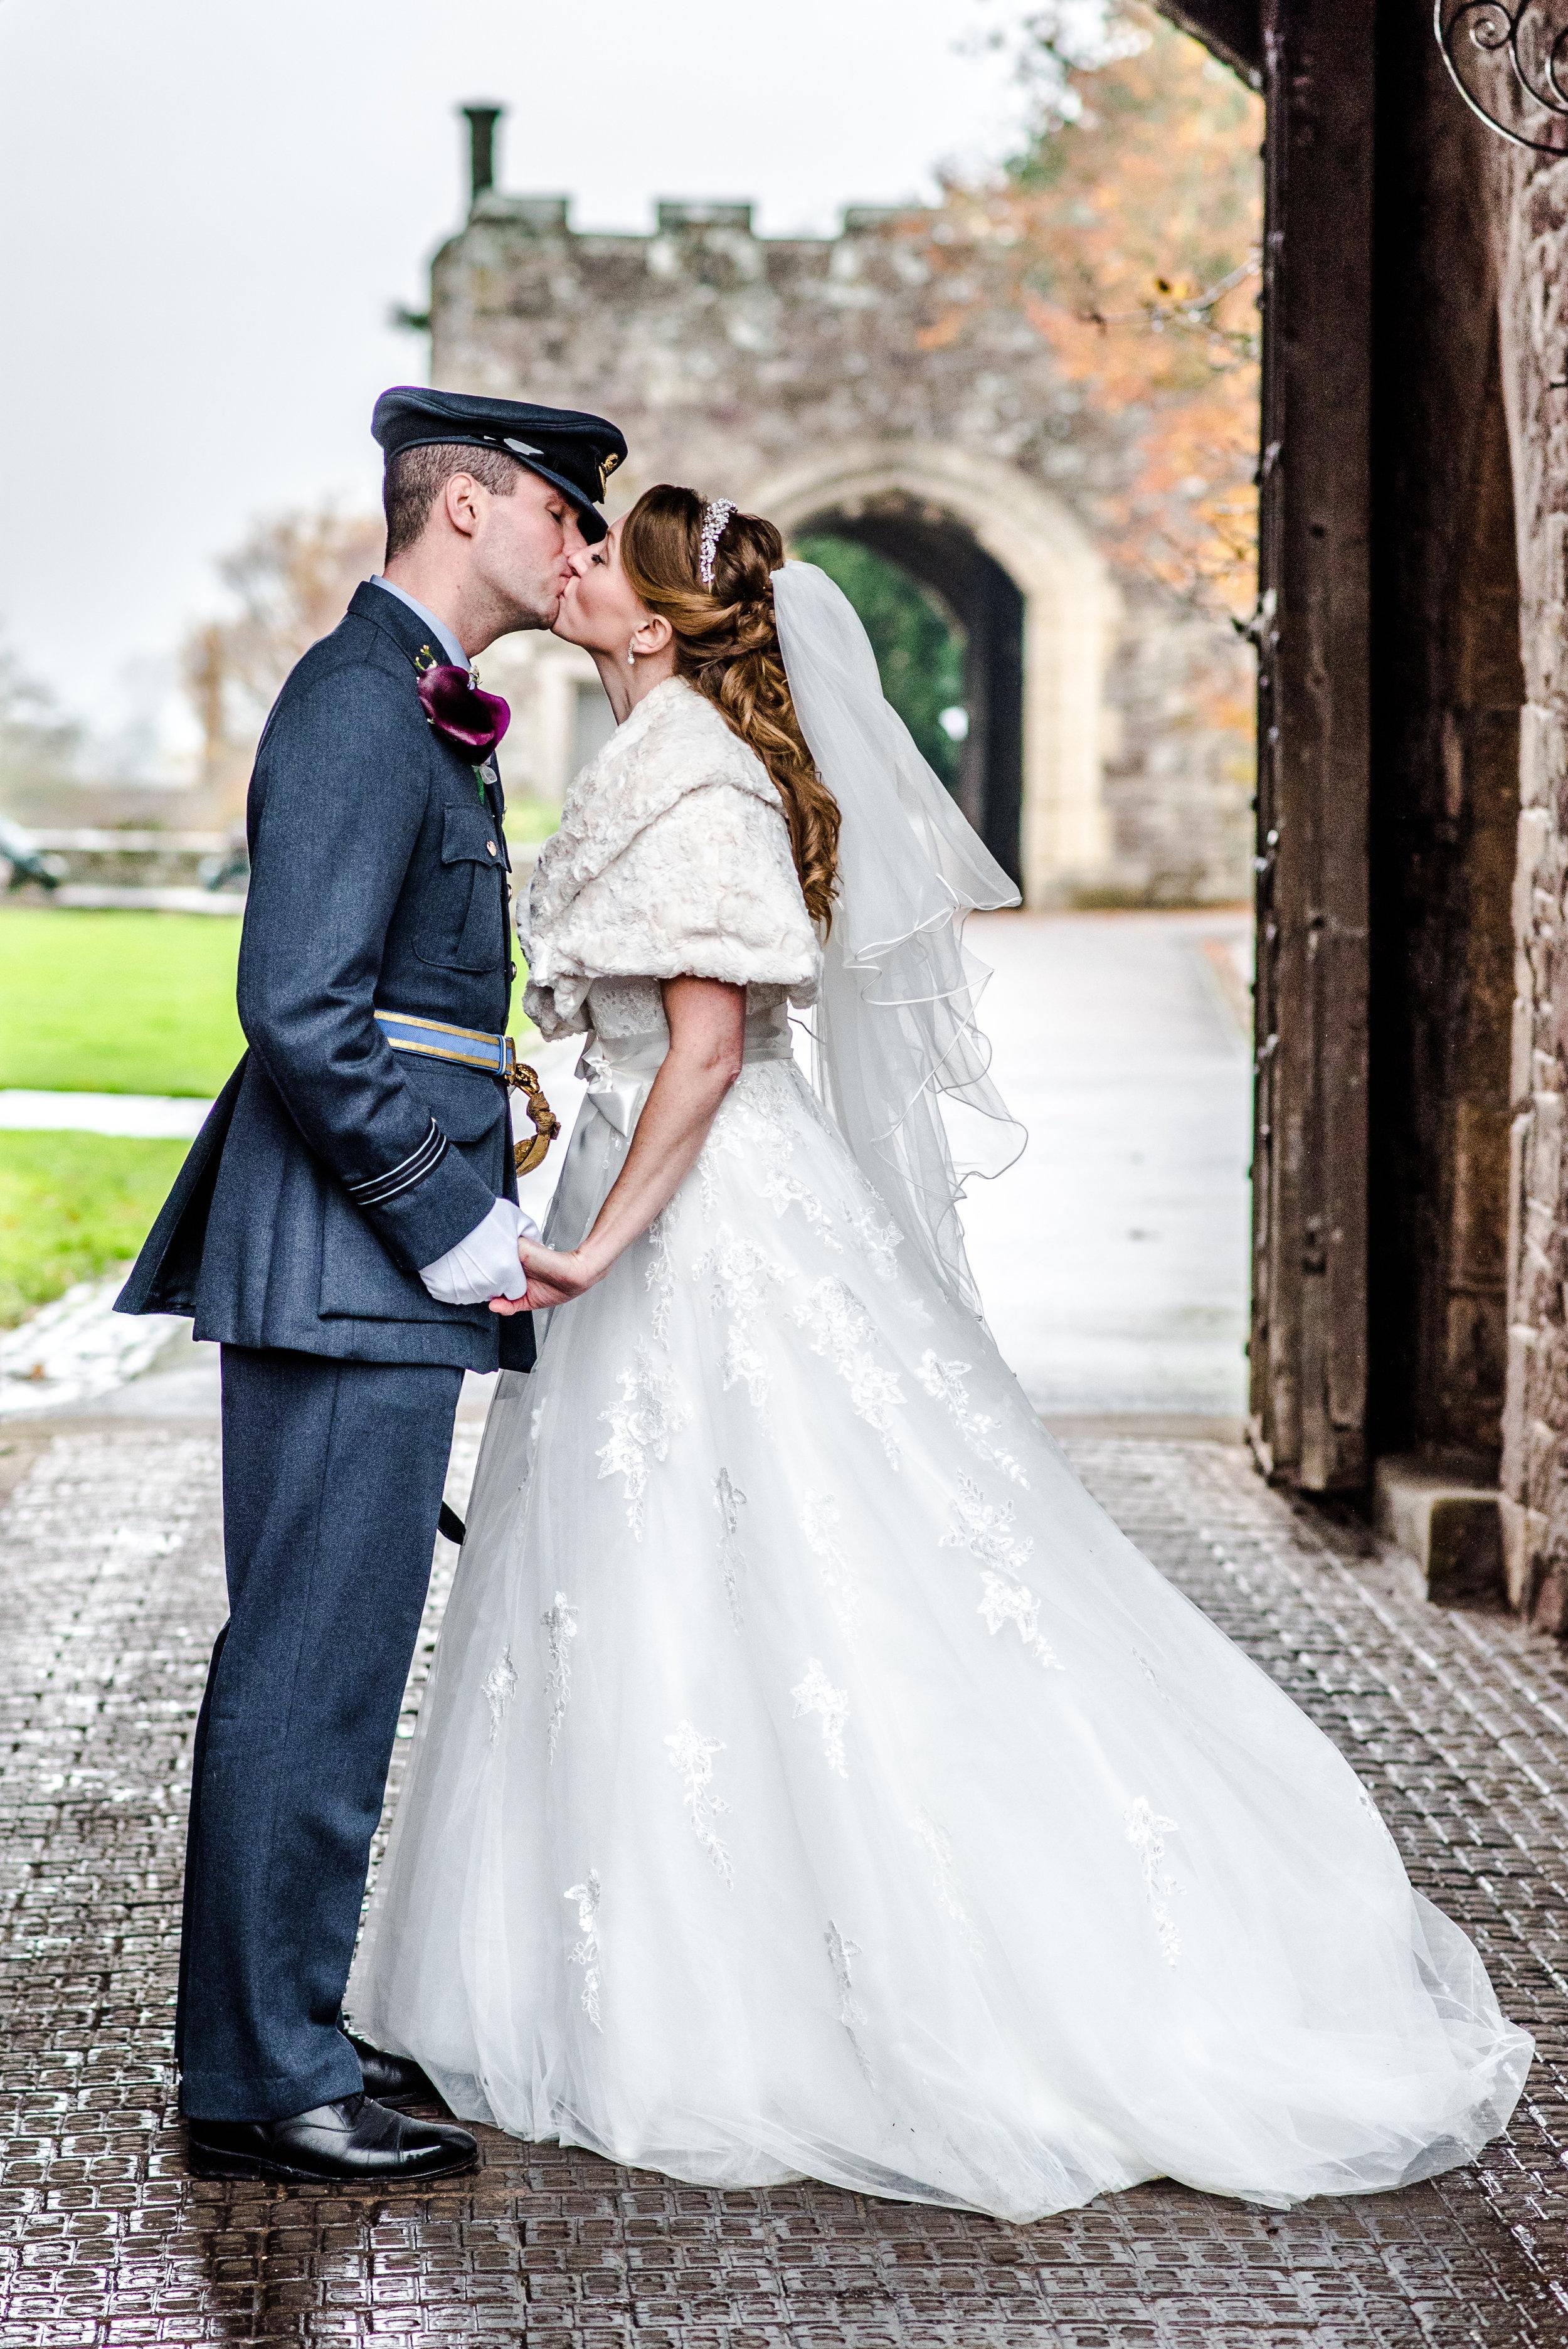 Jim and Naomi's Wedding by Bigeye Photgraphy Berkeley Castle Wedding Photographer (8).jpg